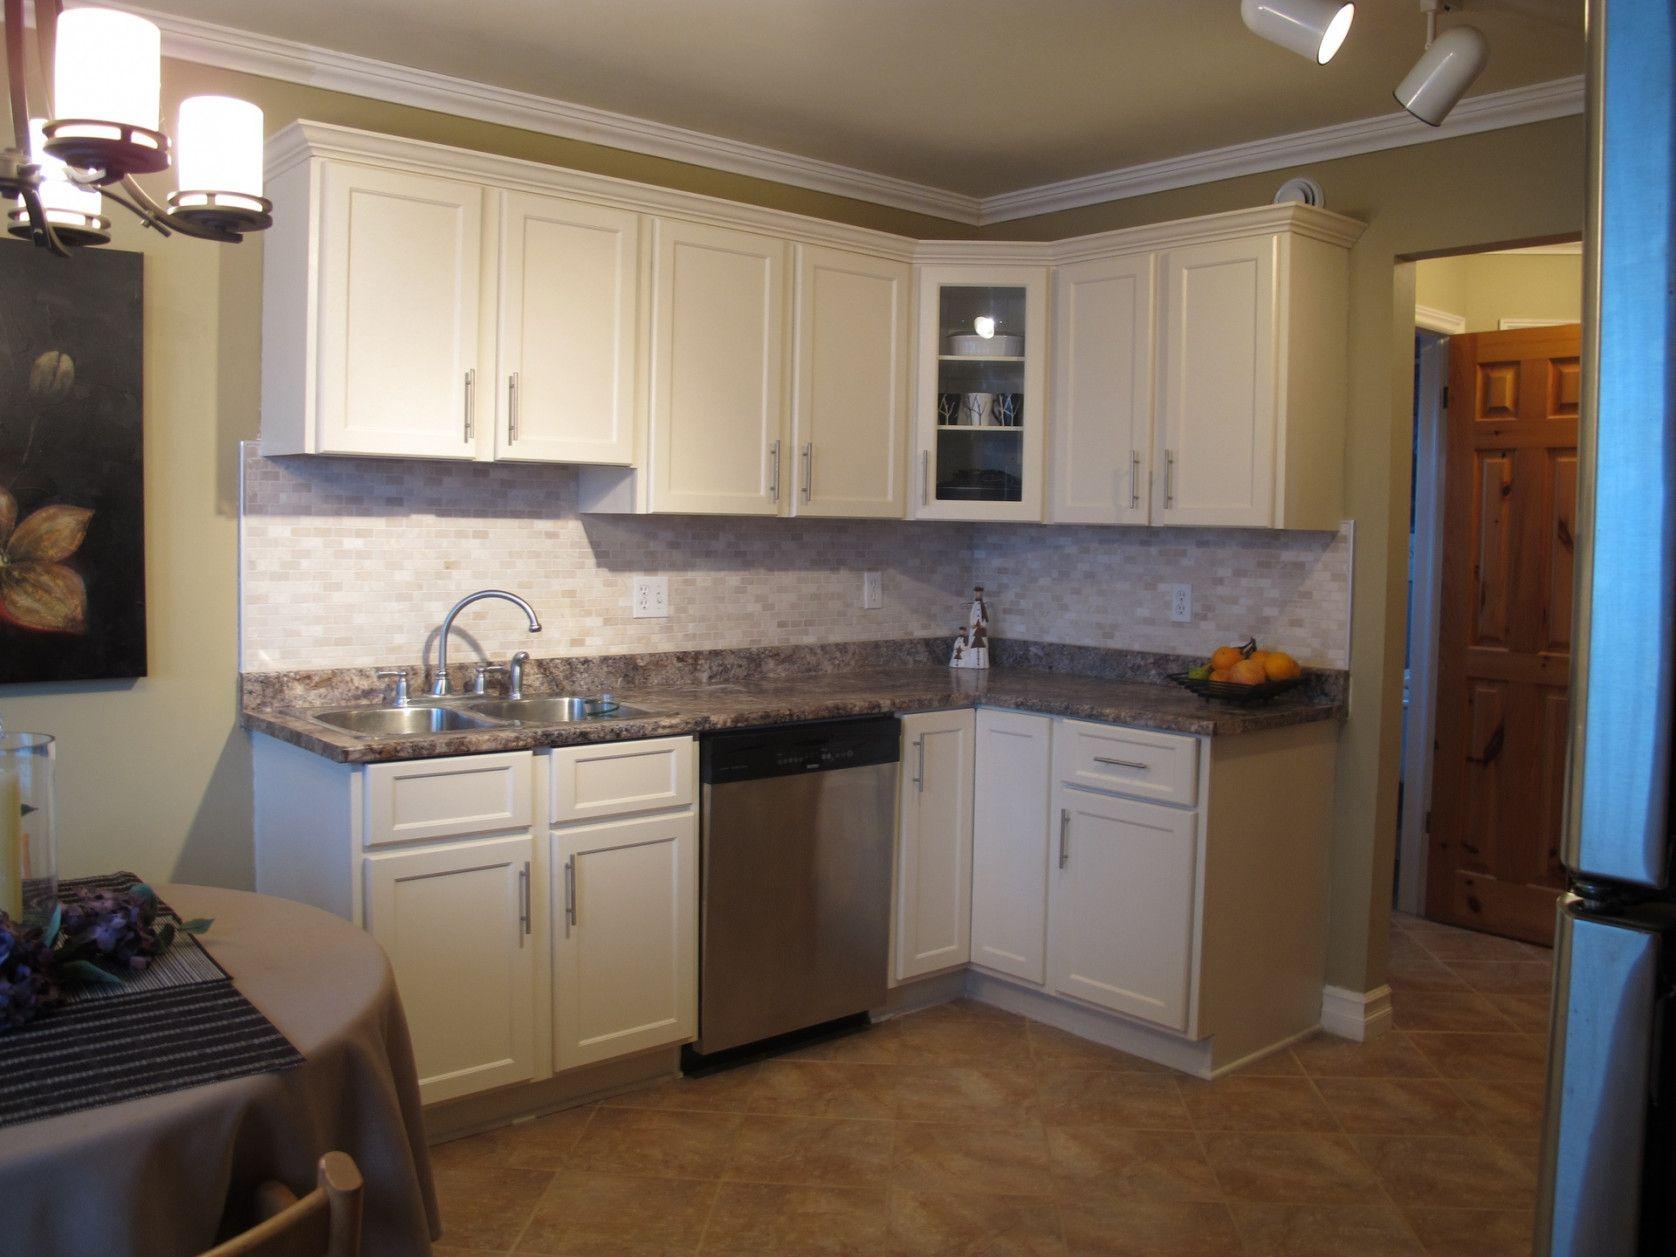 9 Laminate Cabinet Doors Refacing   Kitchen Shelf Display Ideas ...